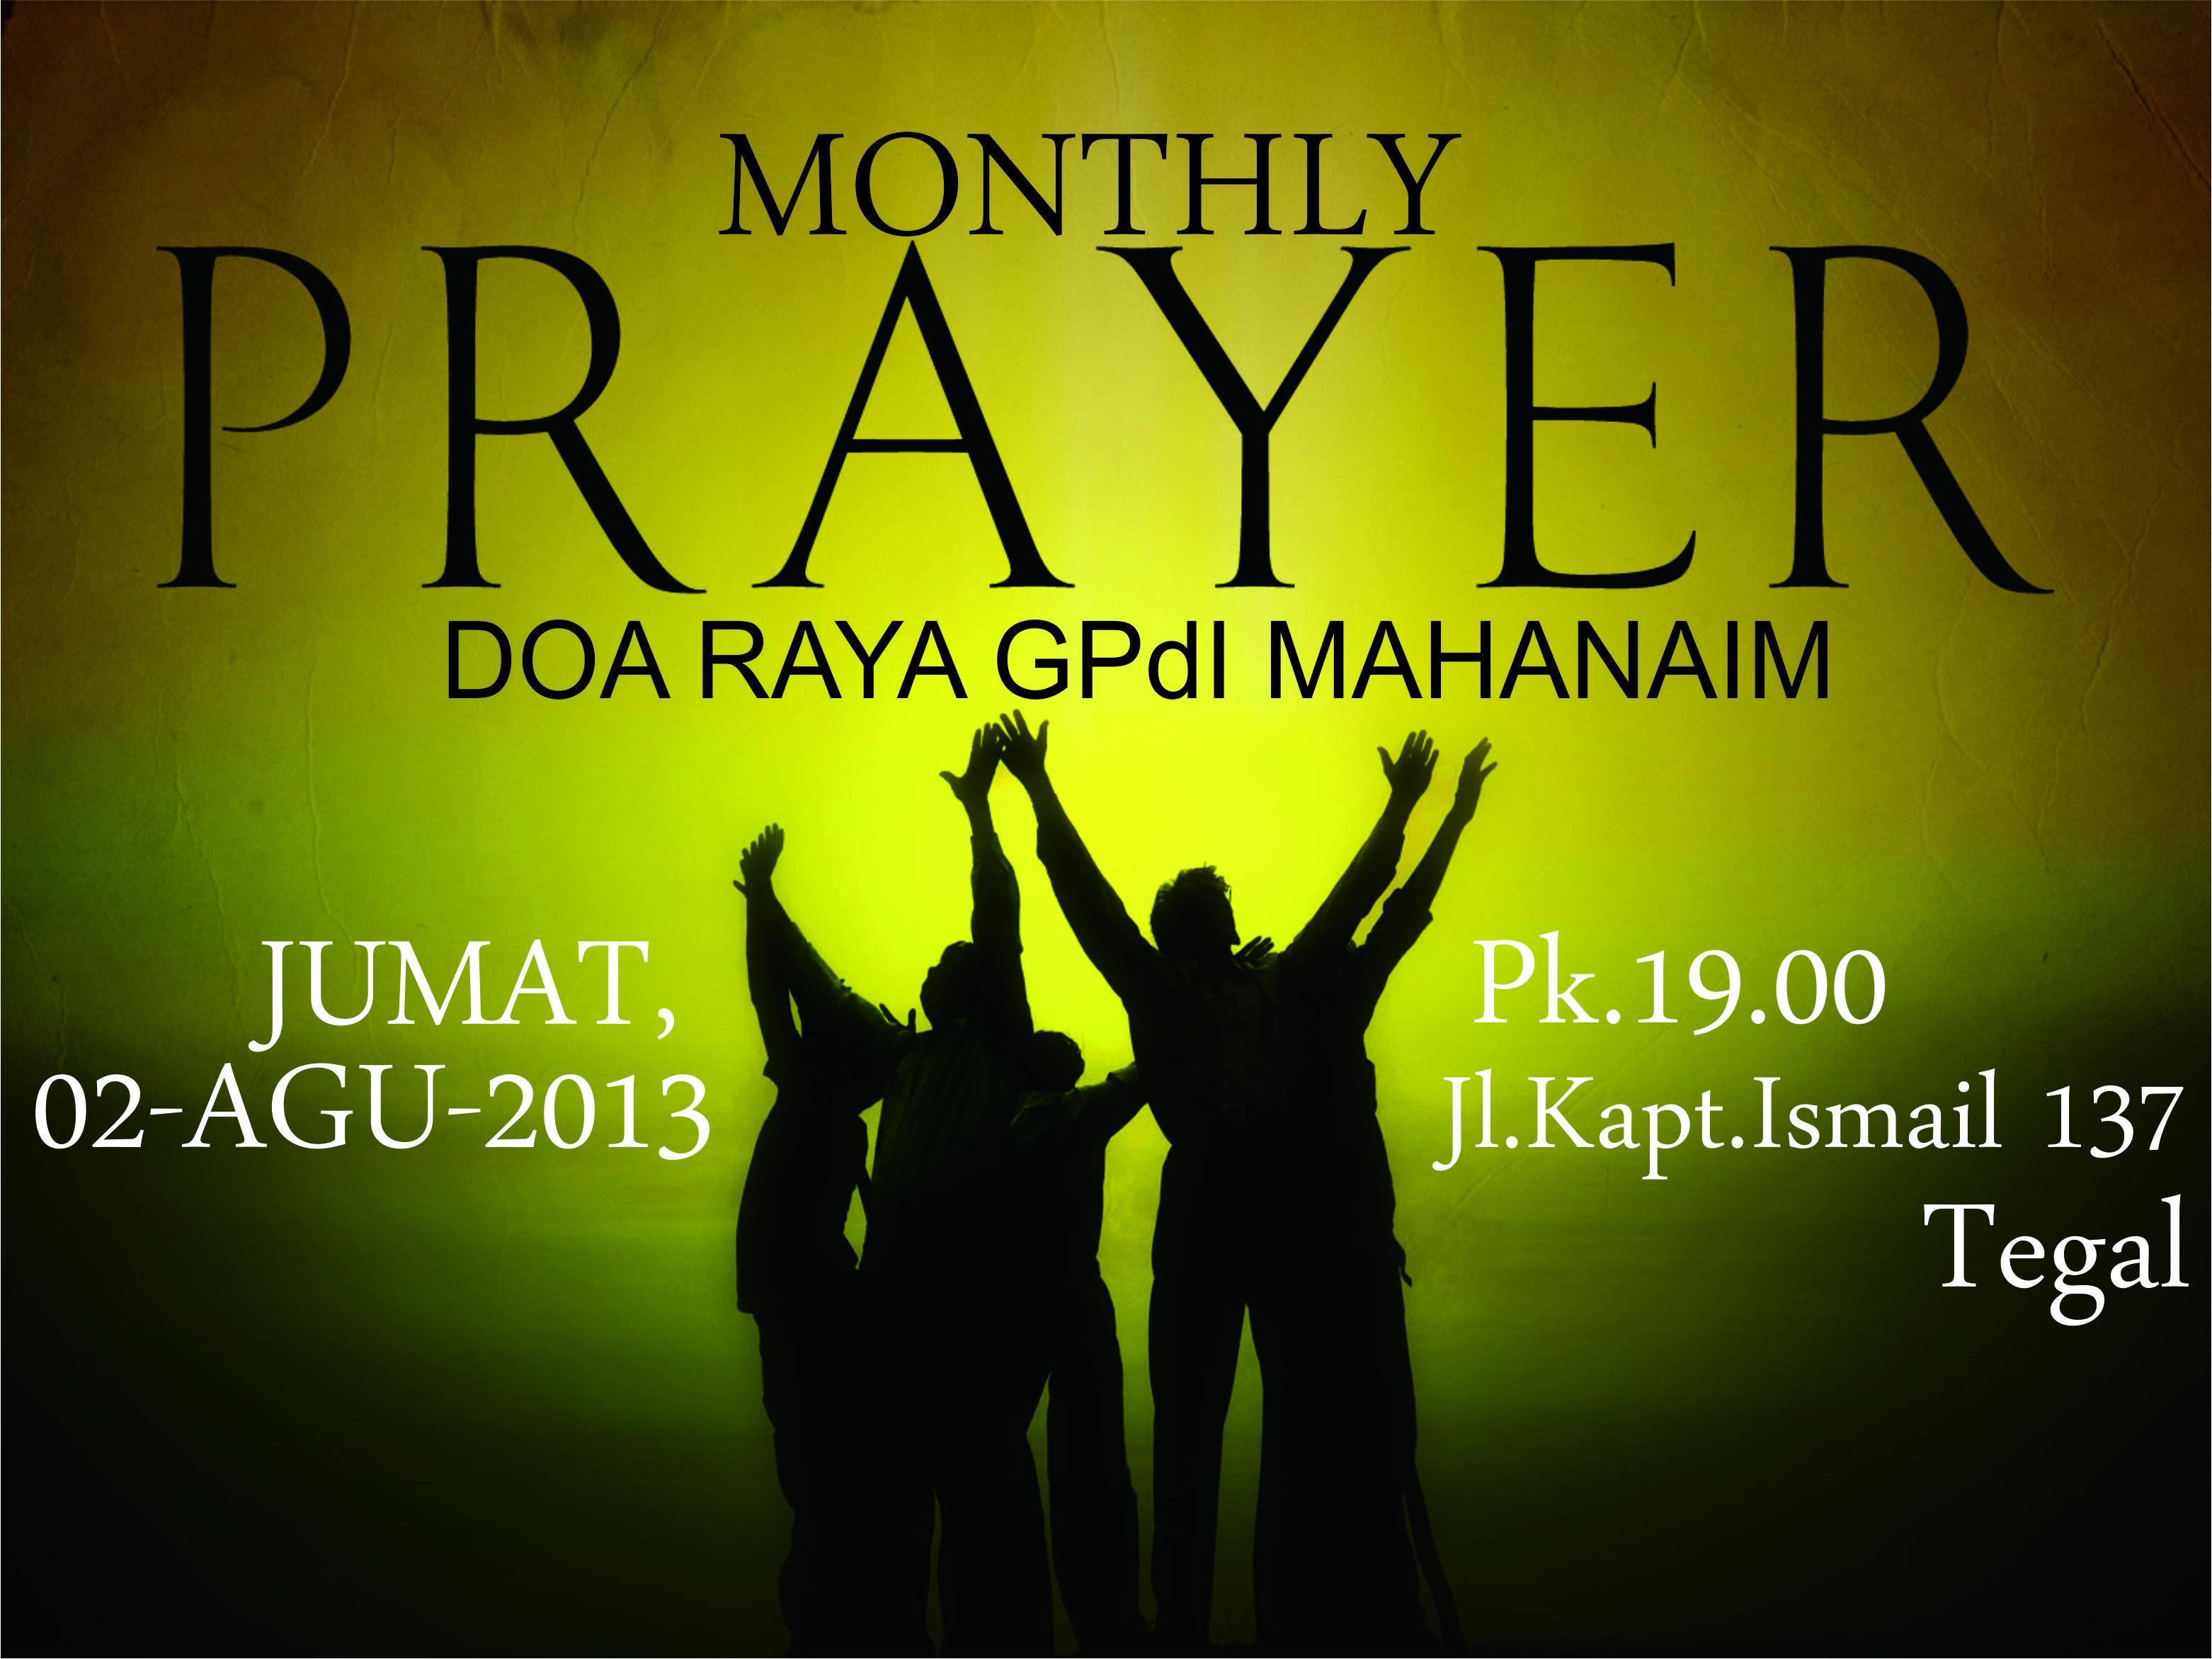 Doa Raya Jumat, 2 Agustus 2013